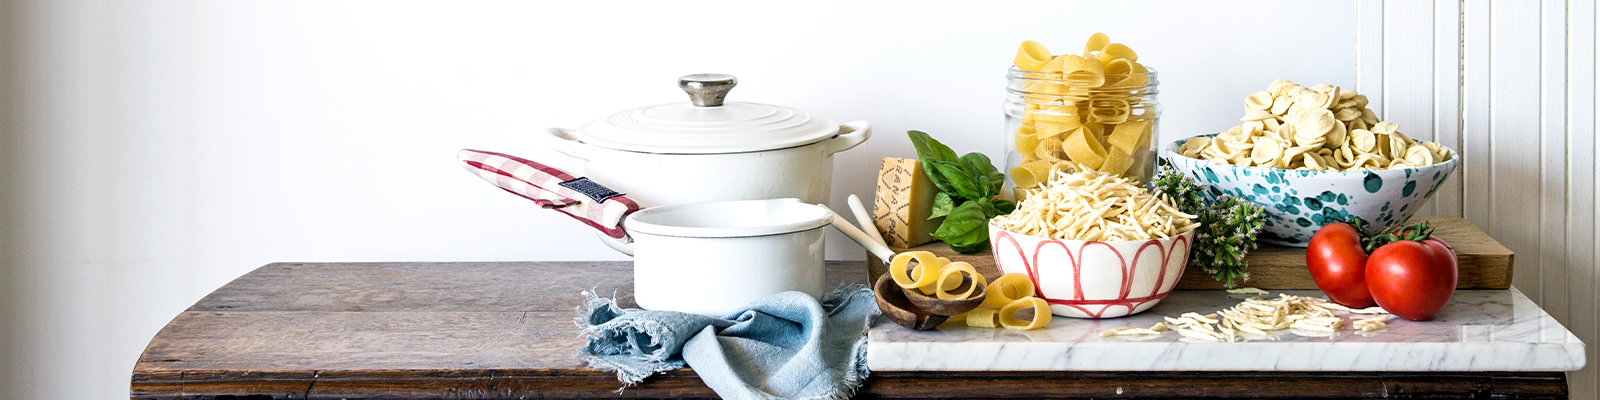 Pasta Garofalo - Pasta Fresca Trafilata